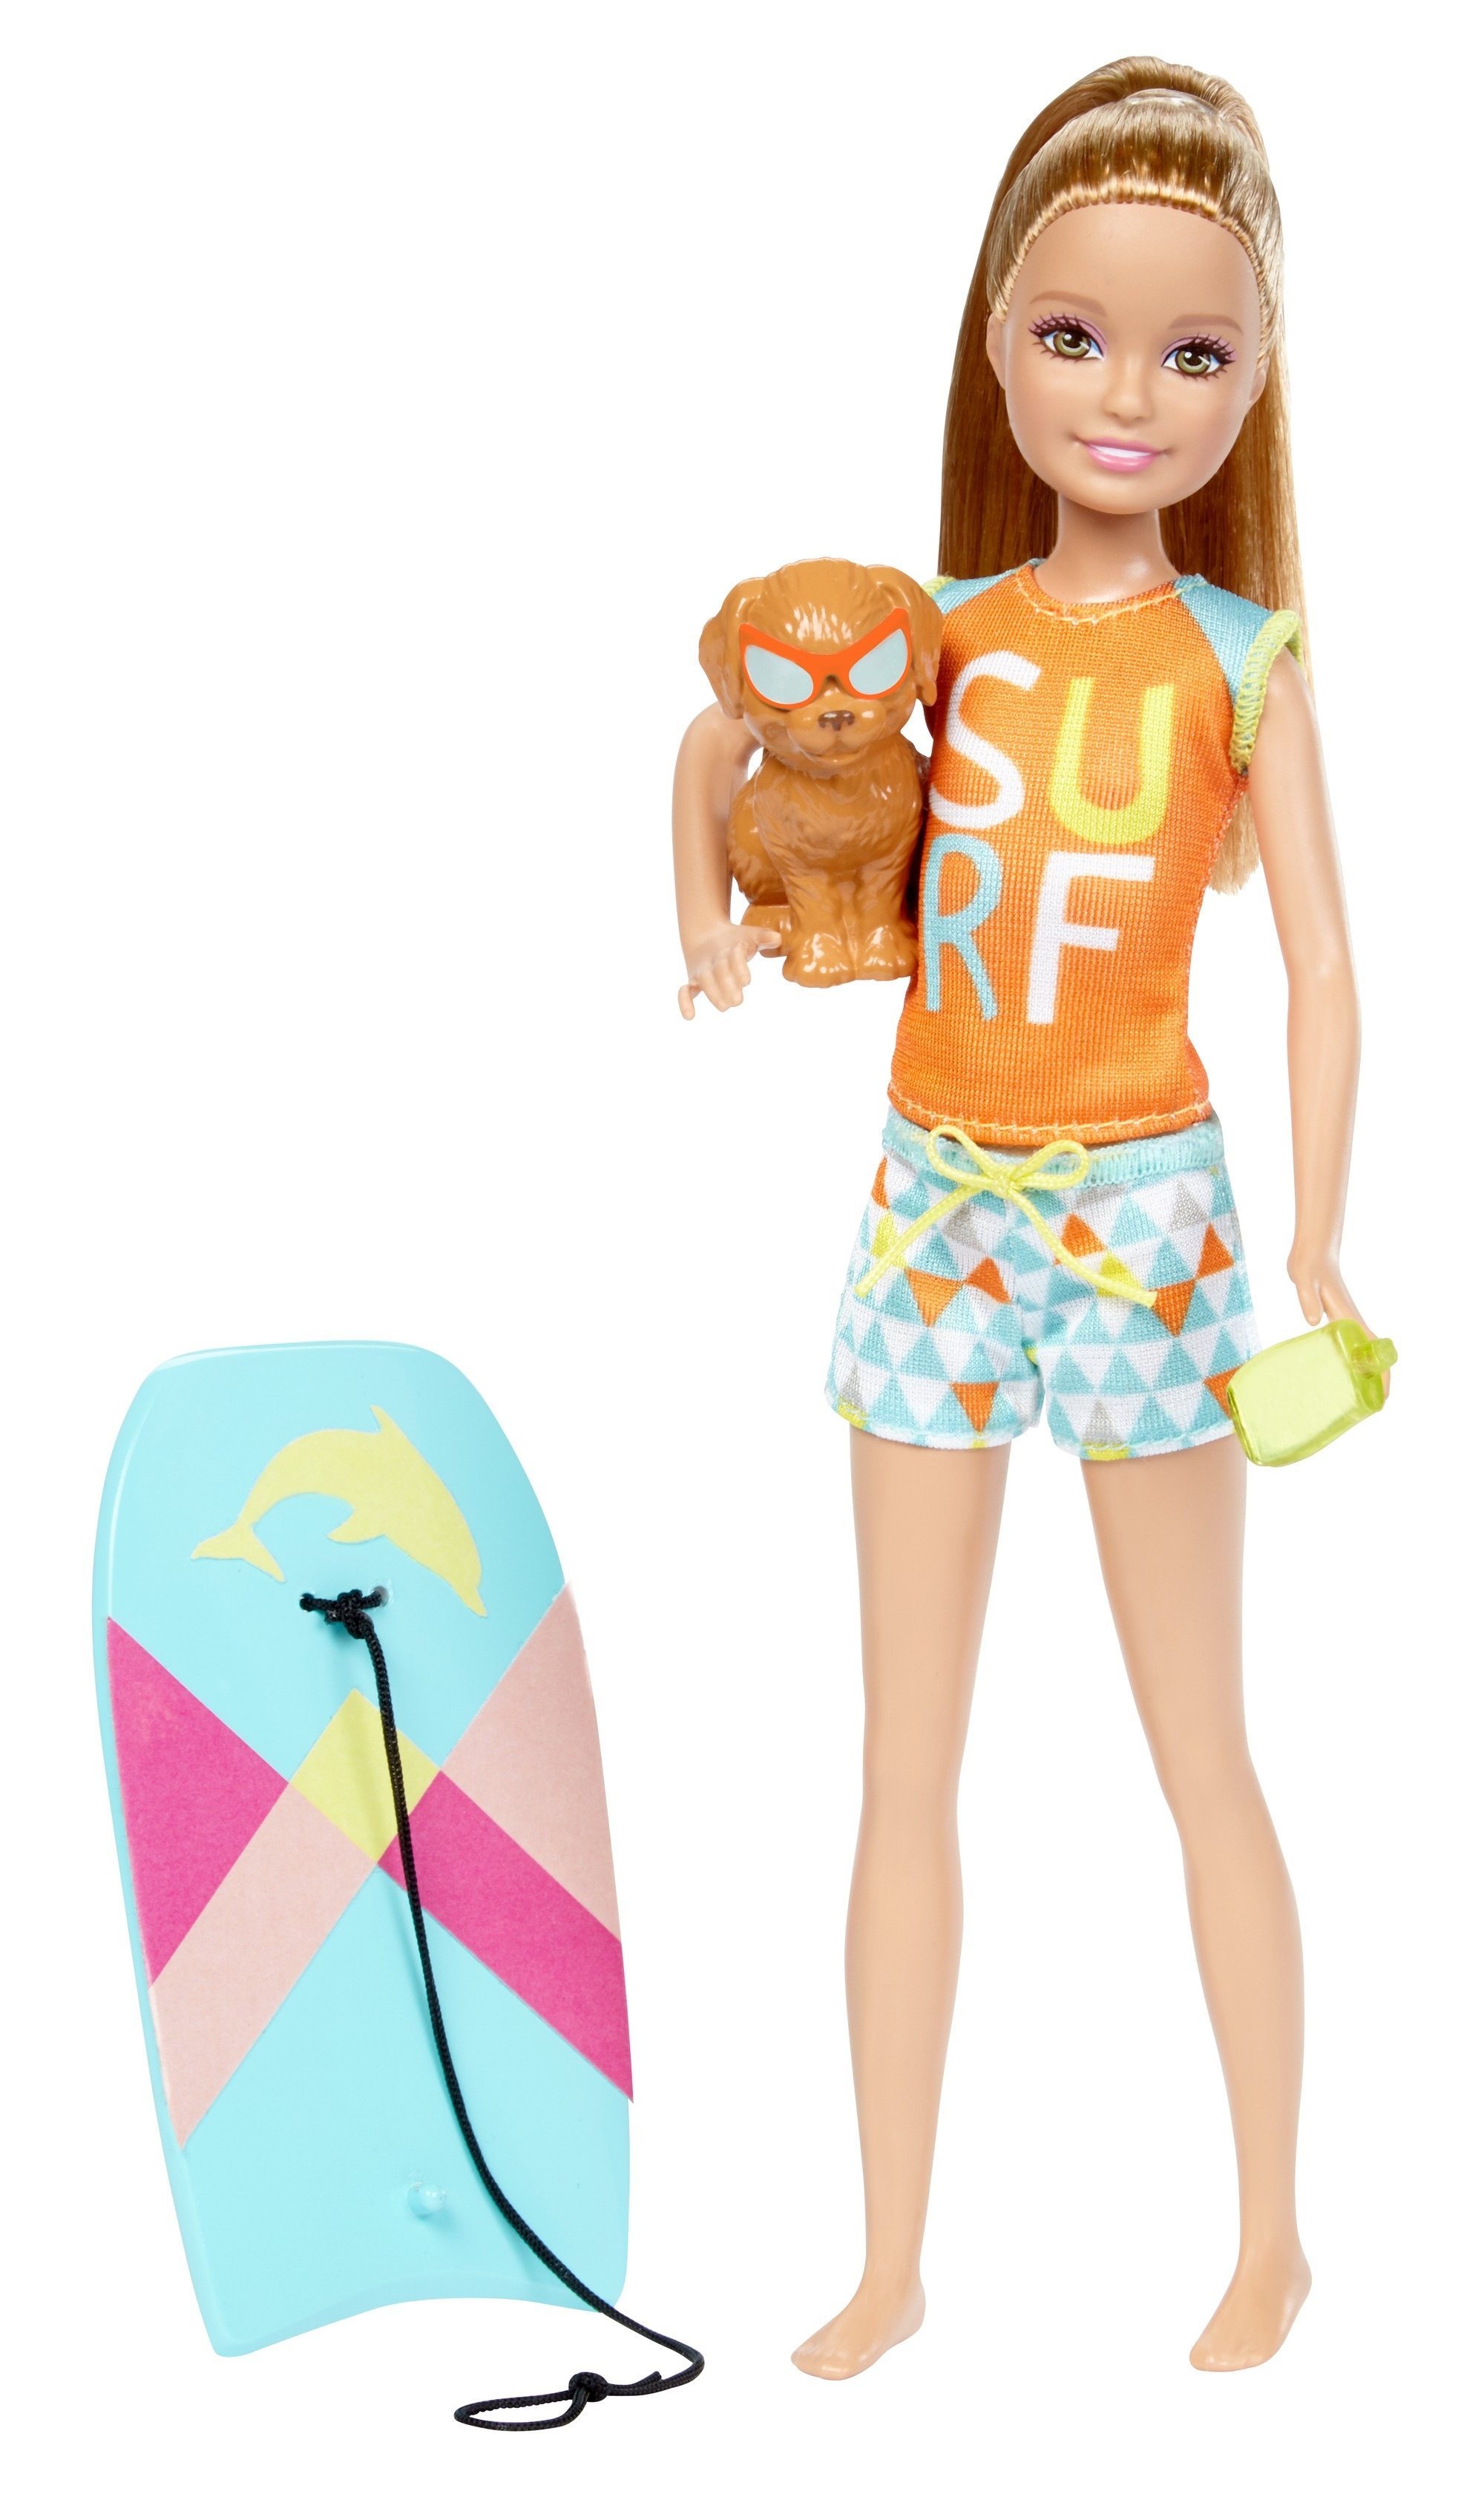 Barbie Barbie Куклы-сестры Barbie «Морские приключения» кукла морские приключения barbie fbd73